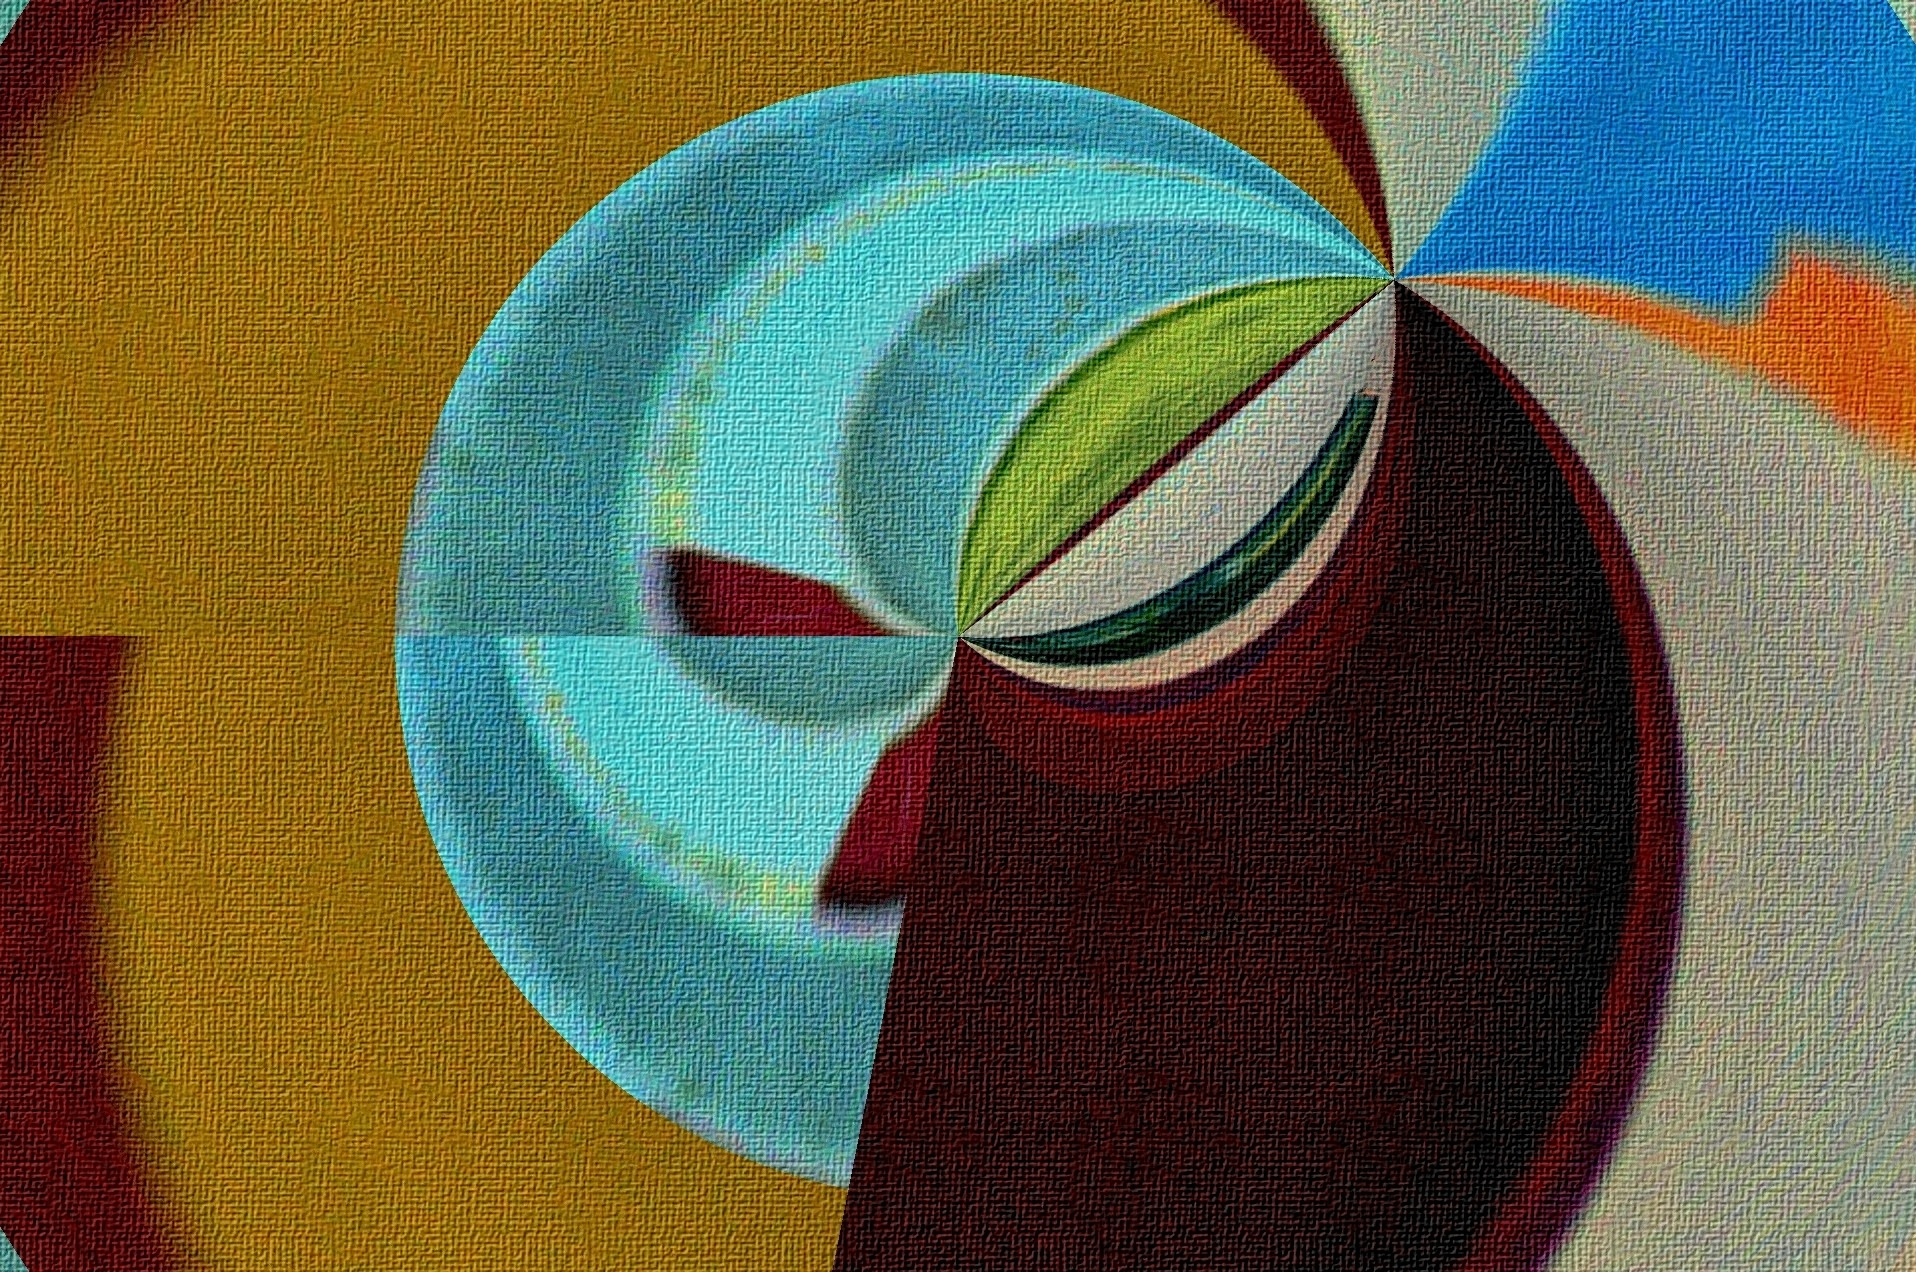 on canvas by José Evaldo Suassuna de Oliveira